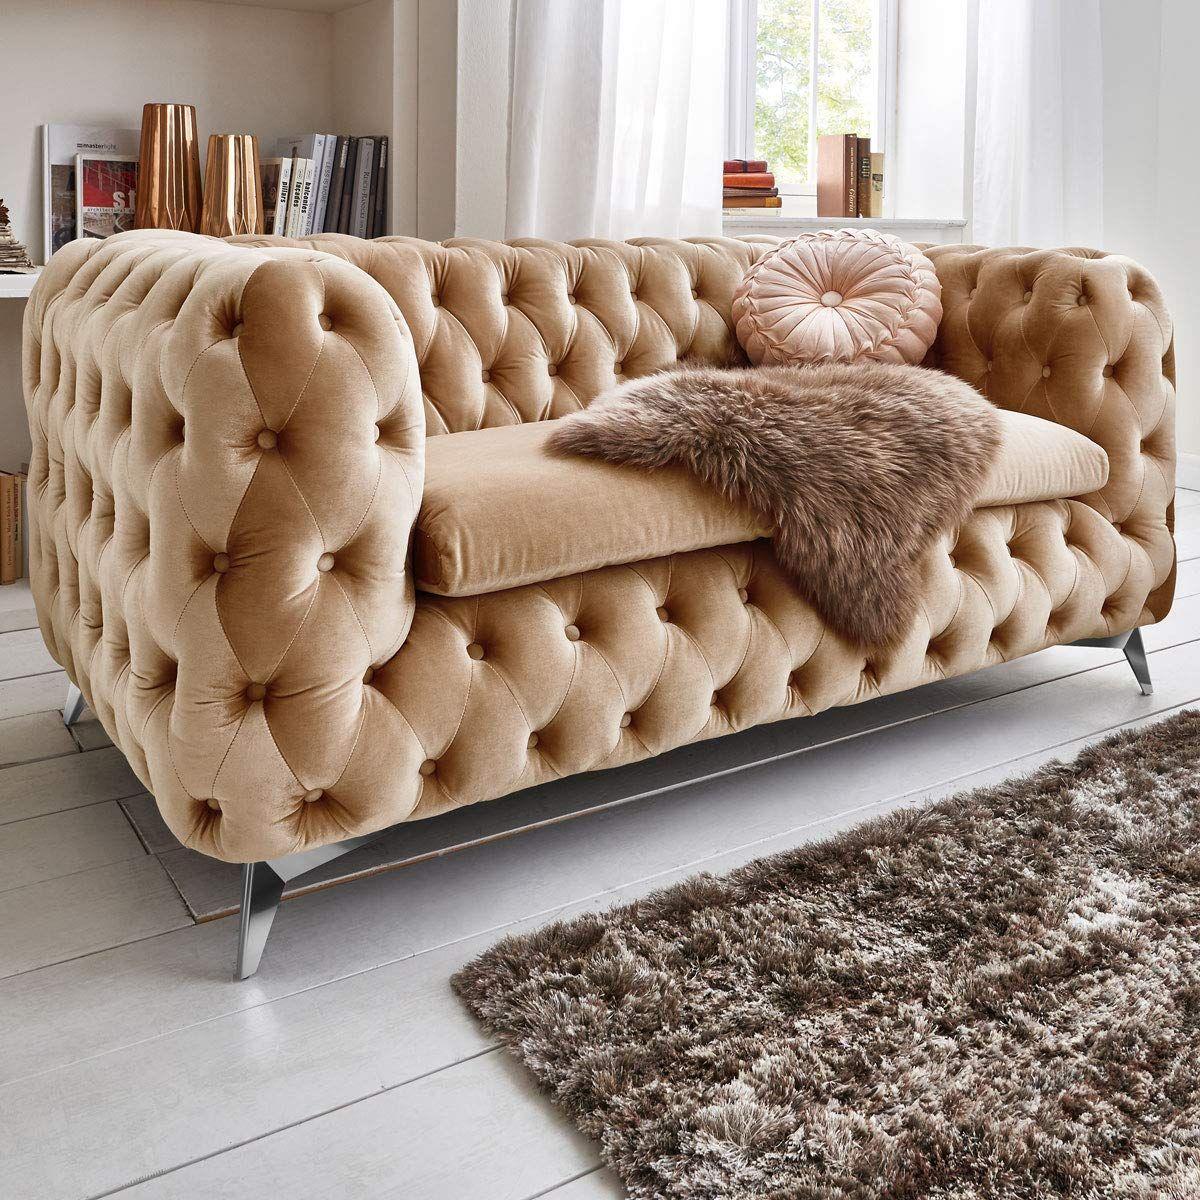 Chesterfield Sofa Couch Stoff Samt 3 Sitzer 2 Sitzer Sessel 1 Sitzer Designer Mobel Emma 2 Sitzer Beige Amazon Chesterfield Sofa Sofa Couch Wohnzimmer Sofa